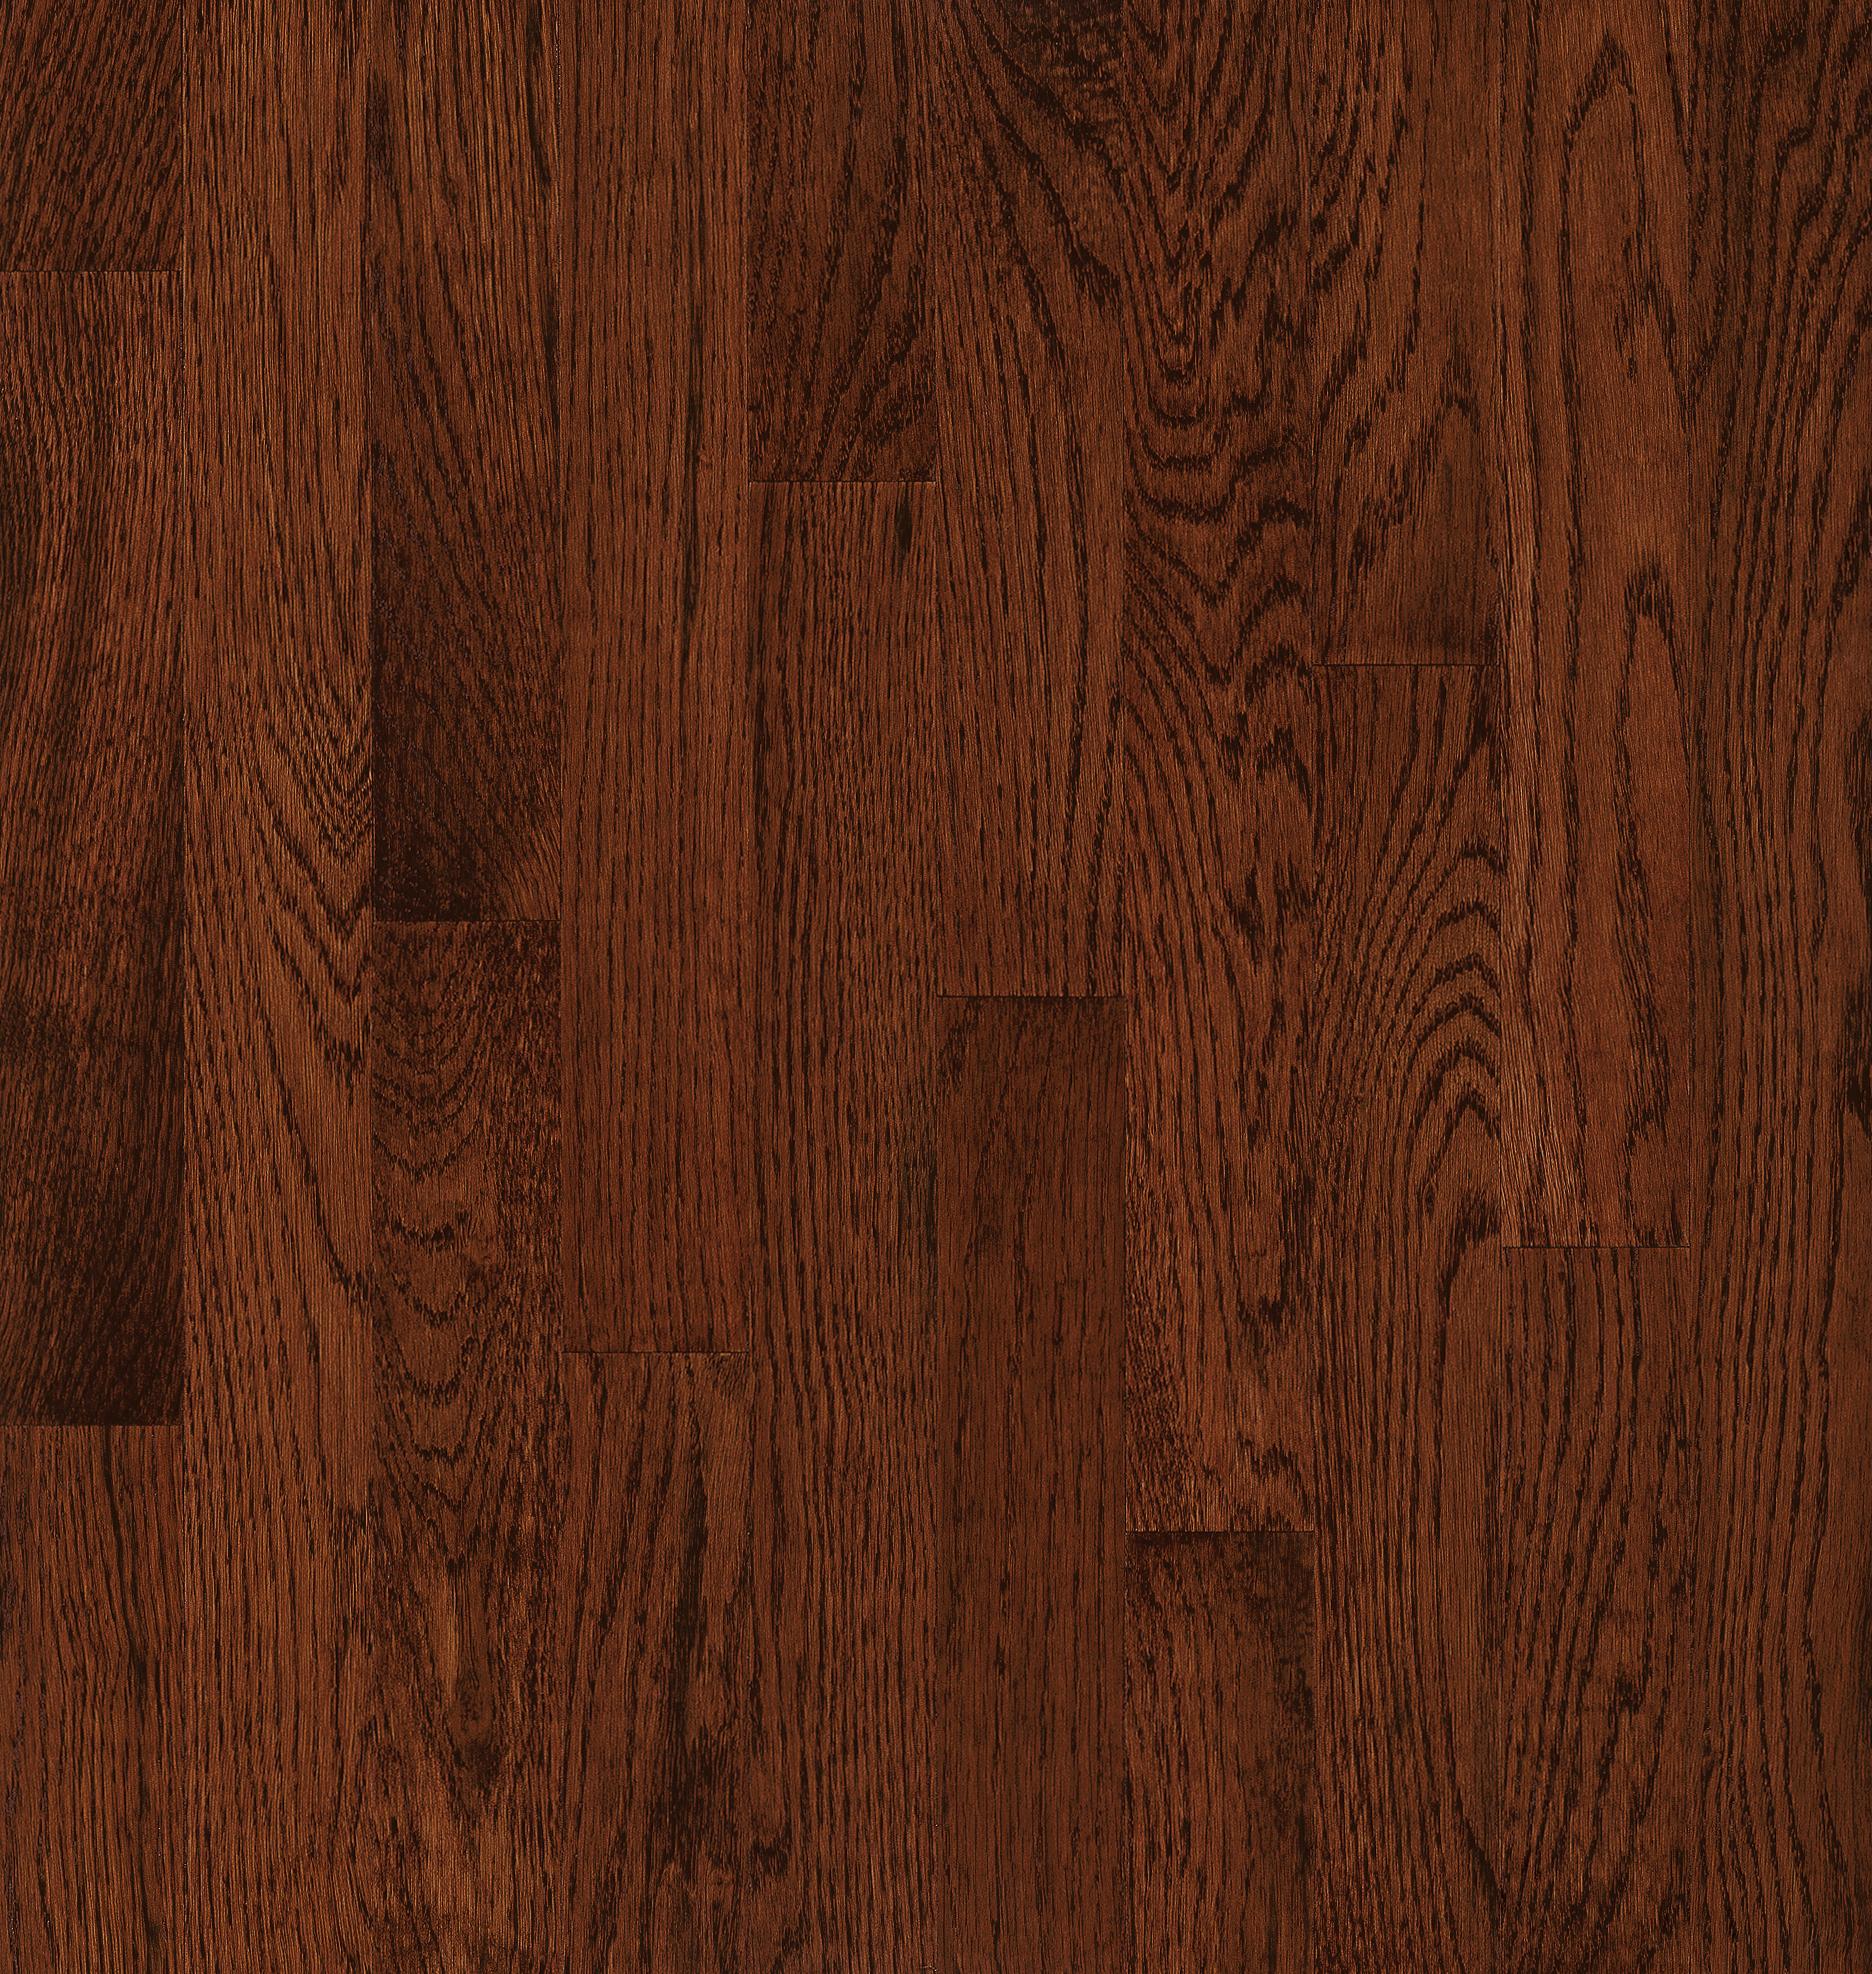 Oak Solid Hardwood C8362